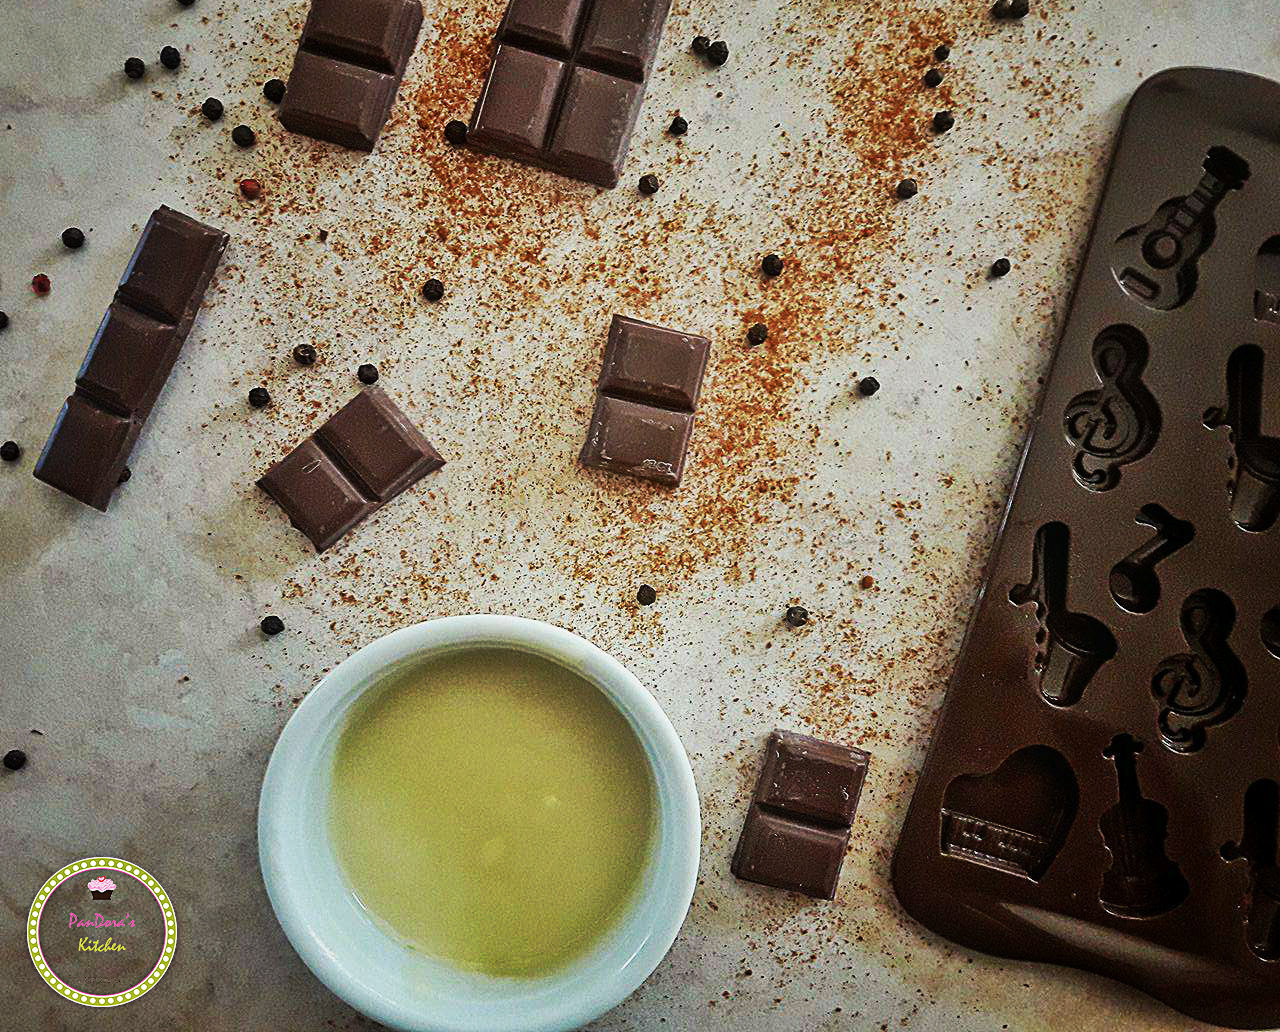 chocolate-choco melody-silikomart-spicy chocolate